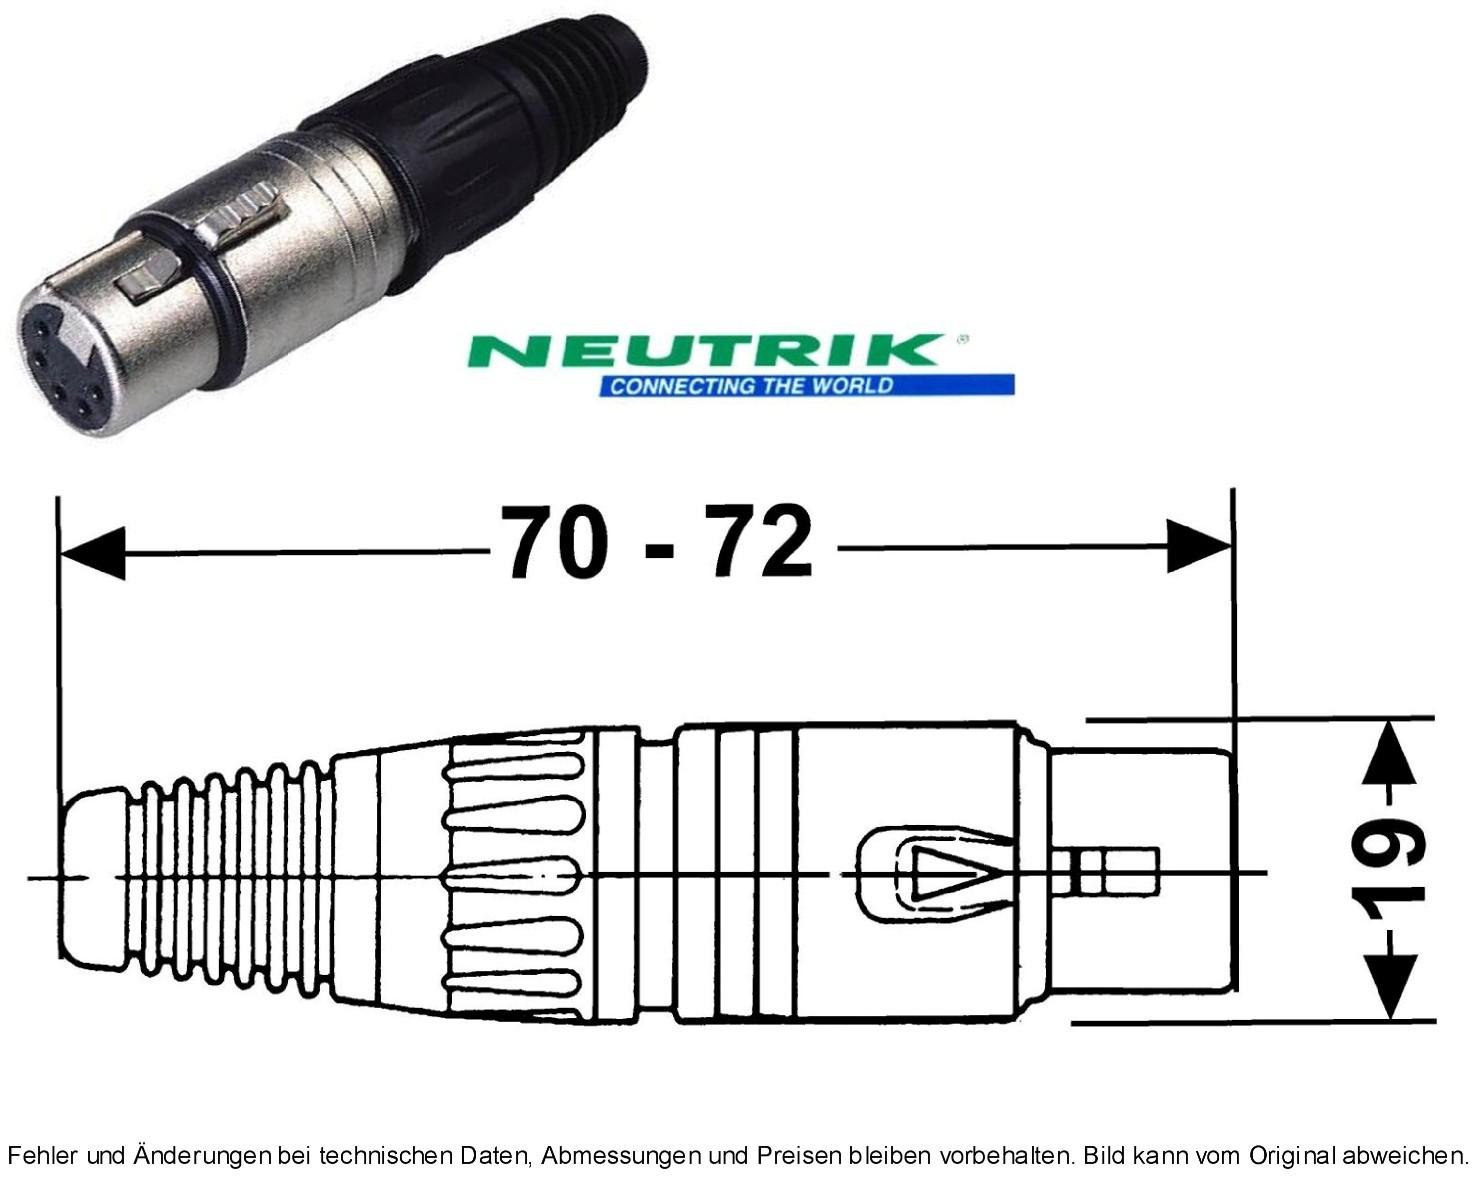 XLR-Kabelbuchse 4-pol 10A Nickel/Silber NEUTRIK NC4FX, Grieder ...